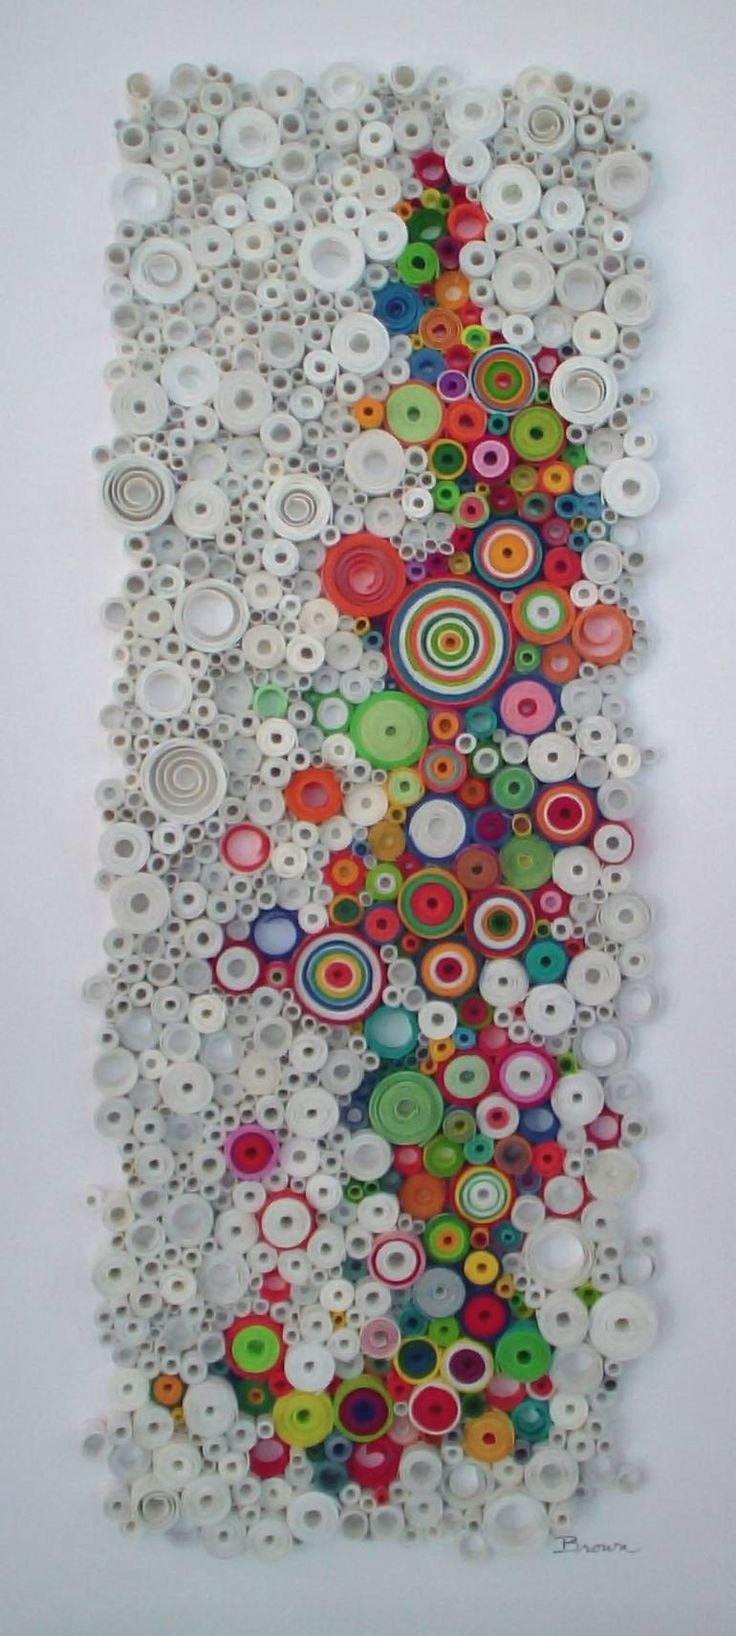 Modern wall murals modern wall coverings - Modern Wall Art Circular Wall Art Original 3 Dimensional Paper Fine Art Rolled Paper Art Daydream Collage By Laurie Brown